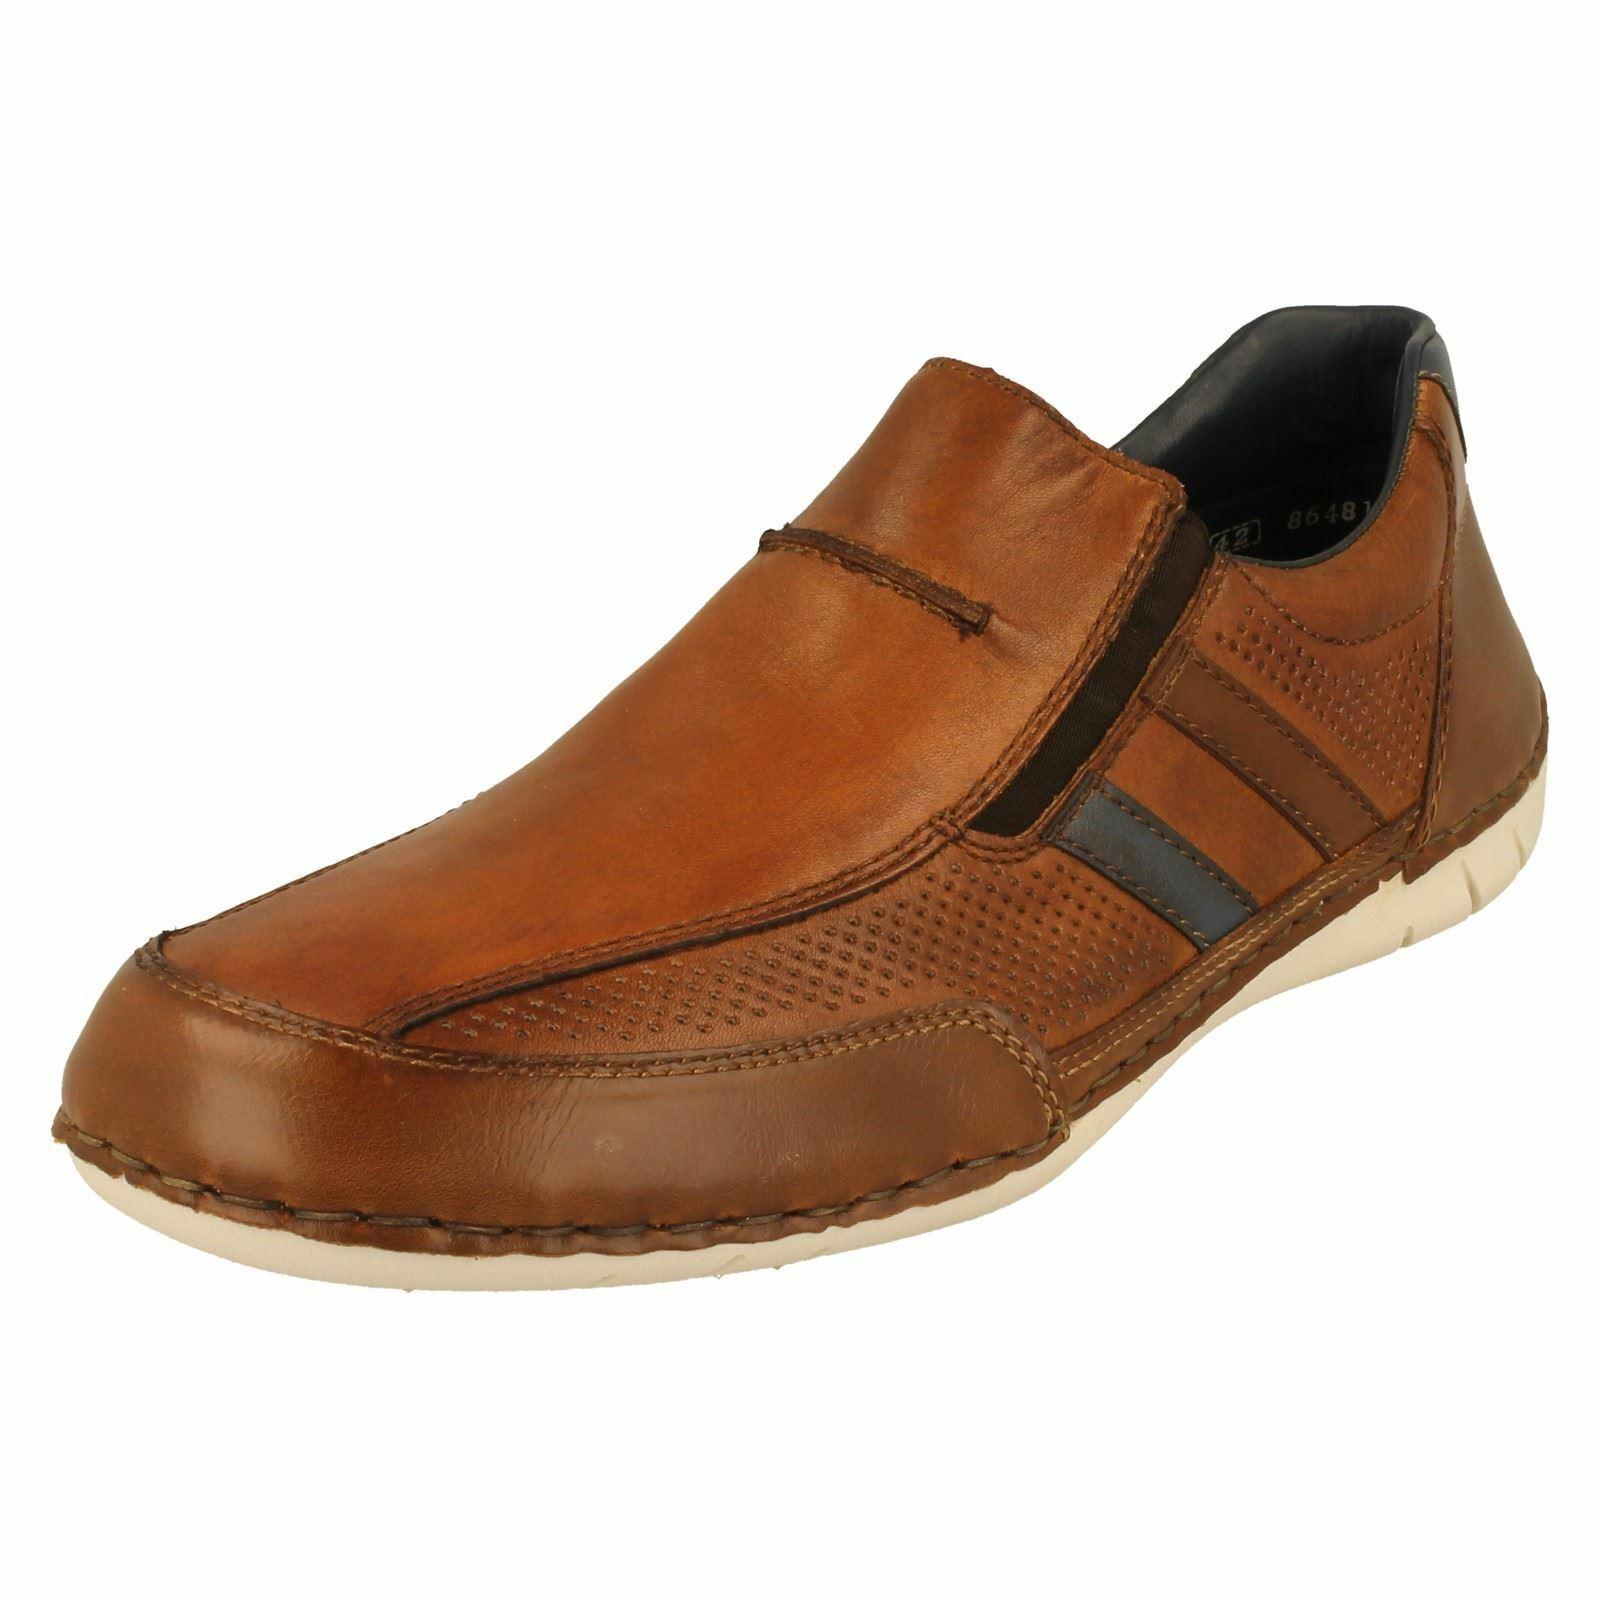 Mens Rieker Casual Slip On shoes B8256